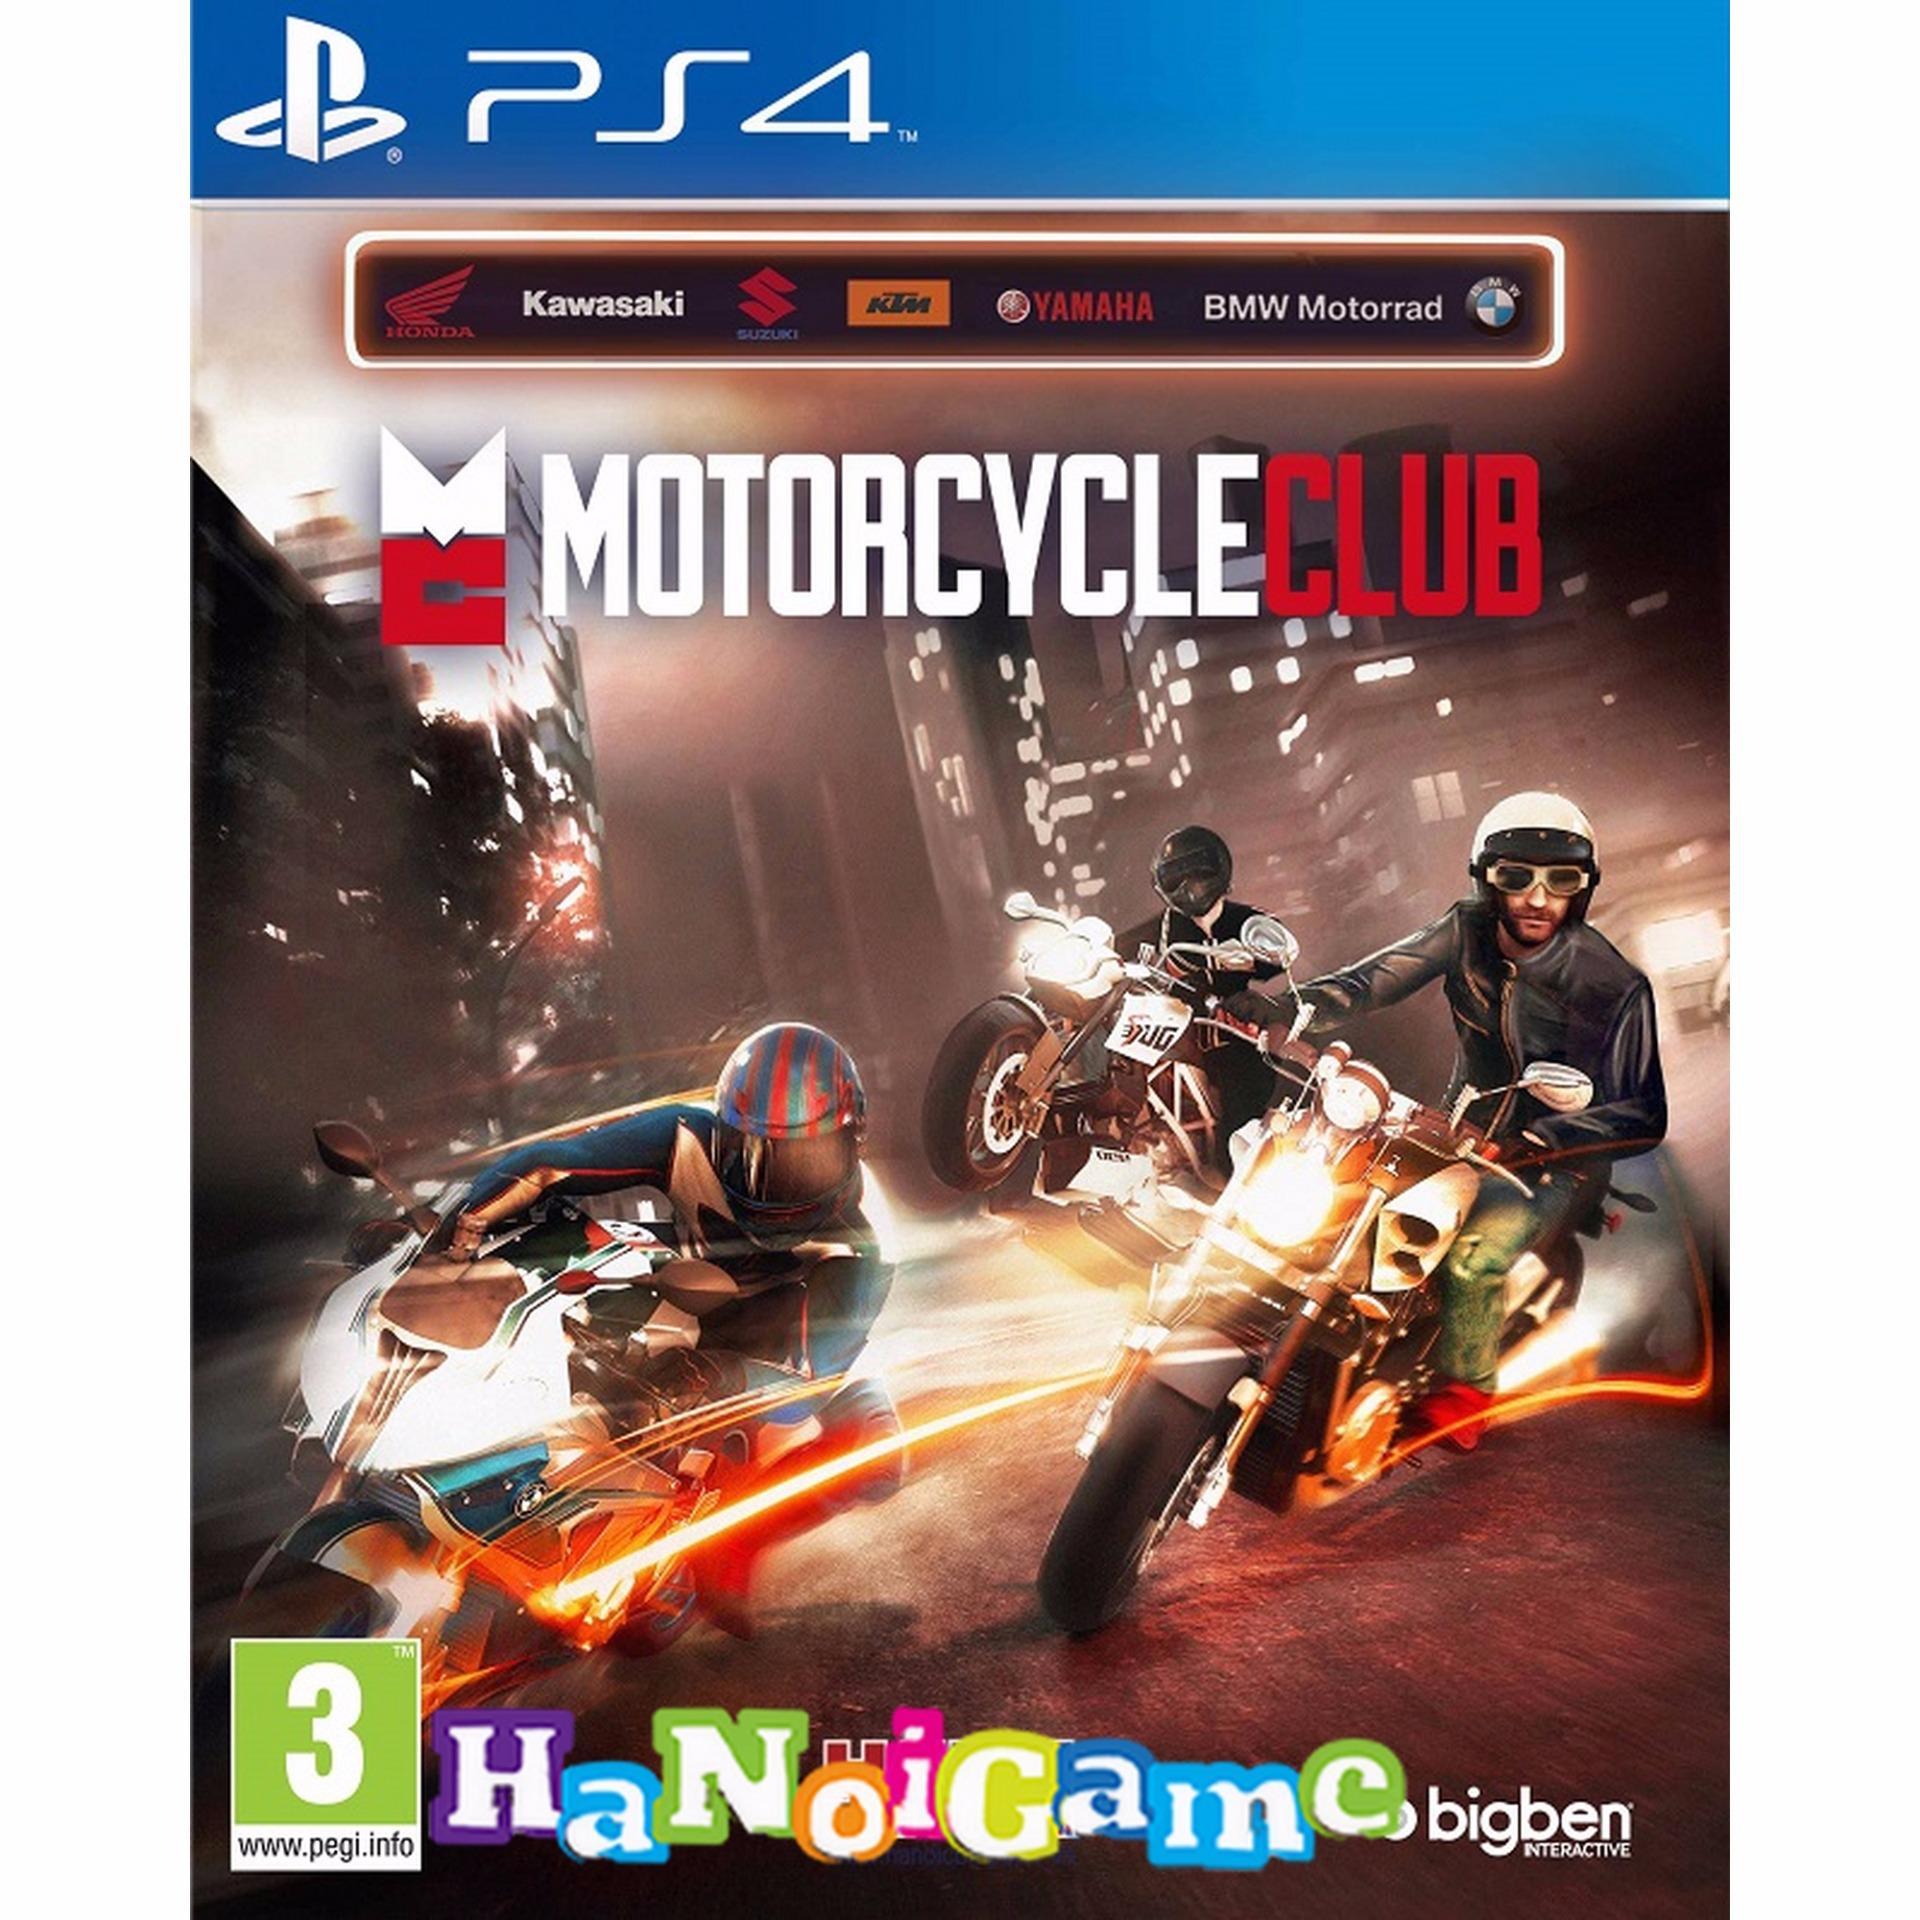 Đĩa Game Ps4: Motorcycle Club